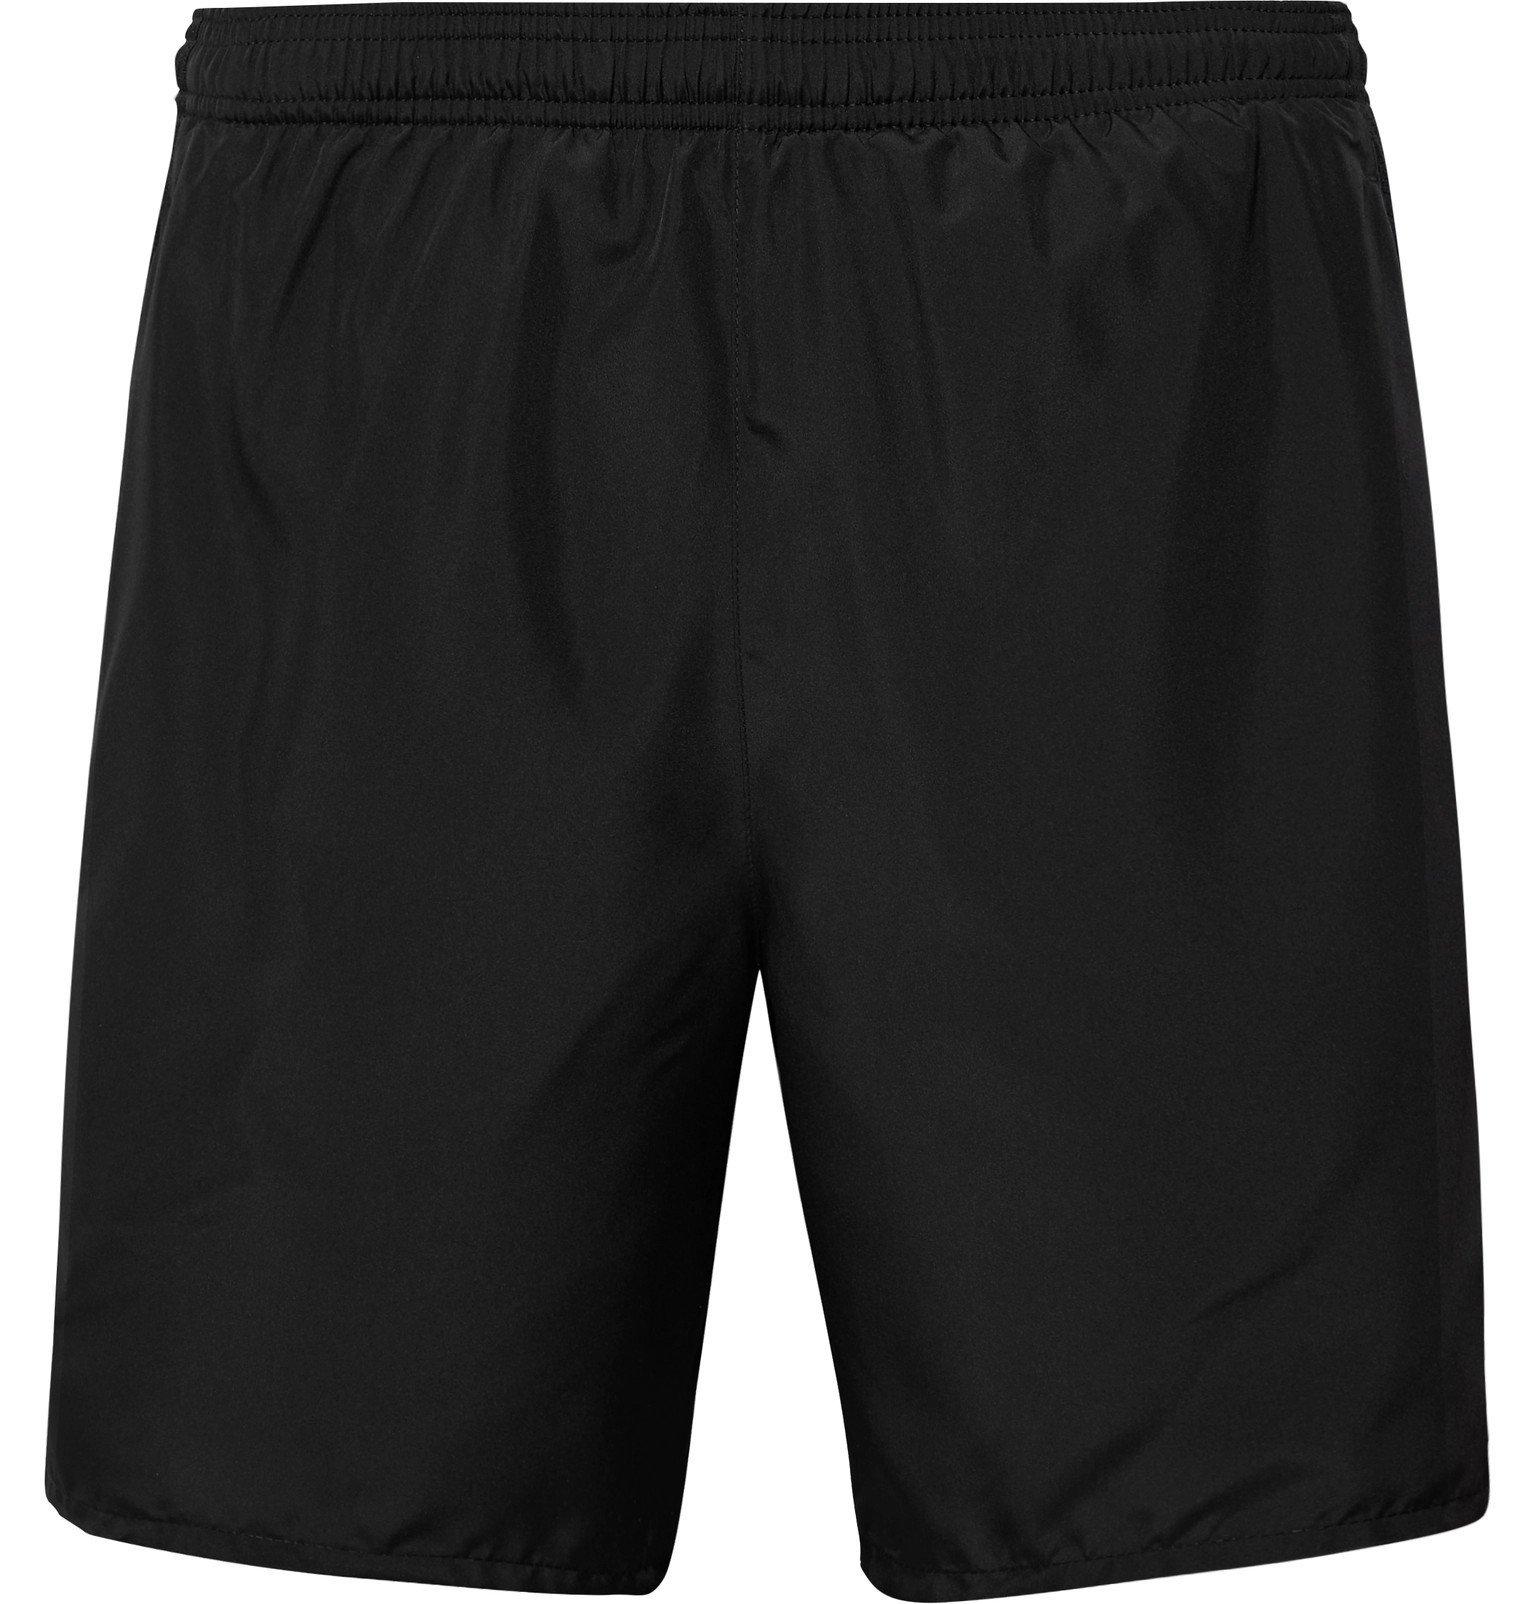 Nike Running - Challenger Dri-FIT Shorts - Black